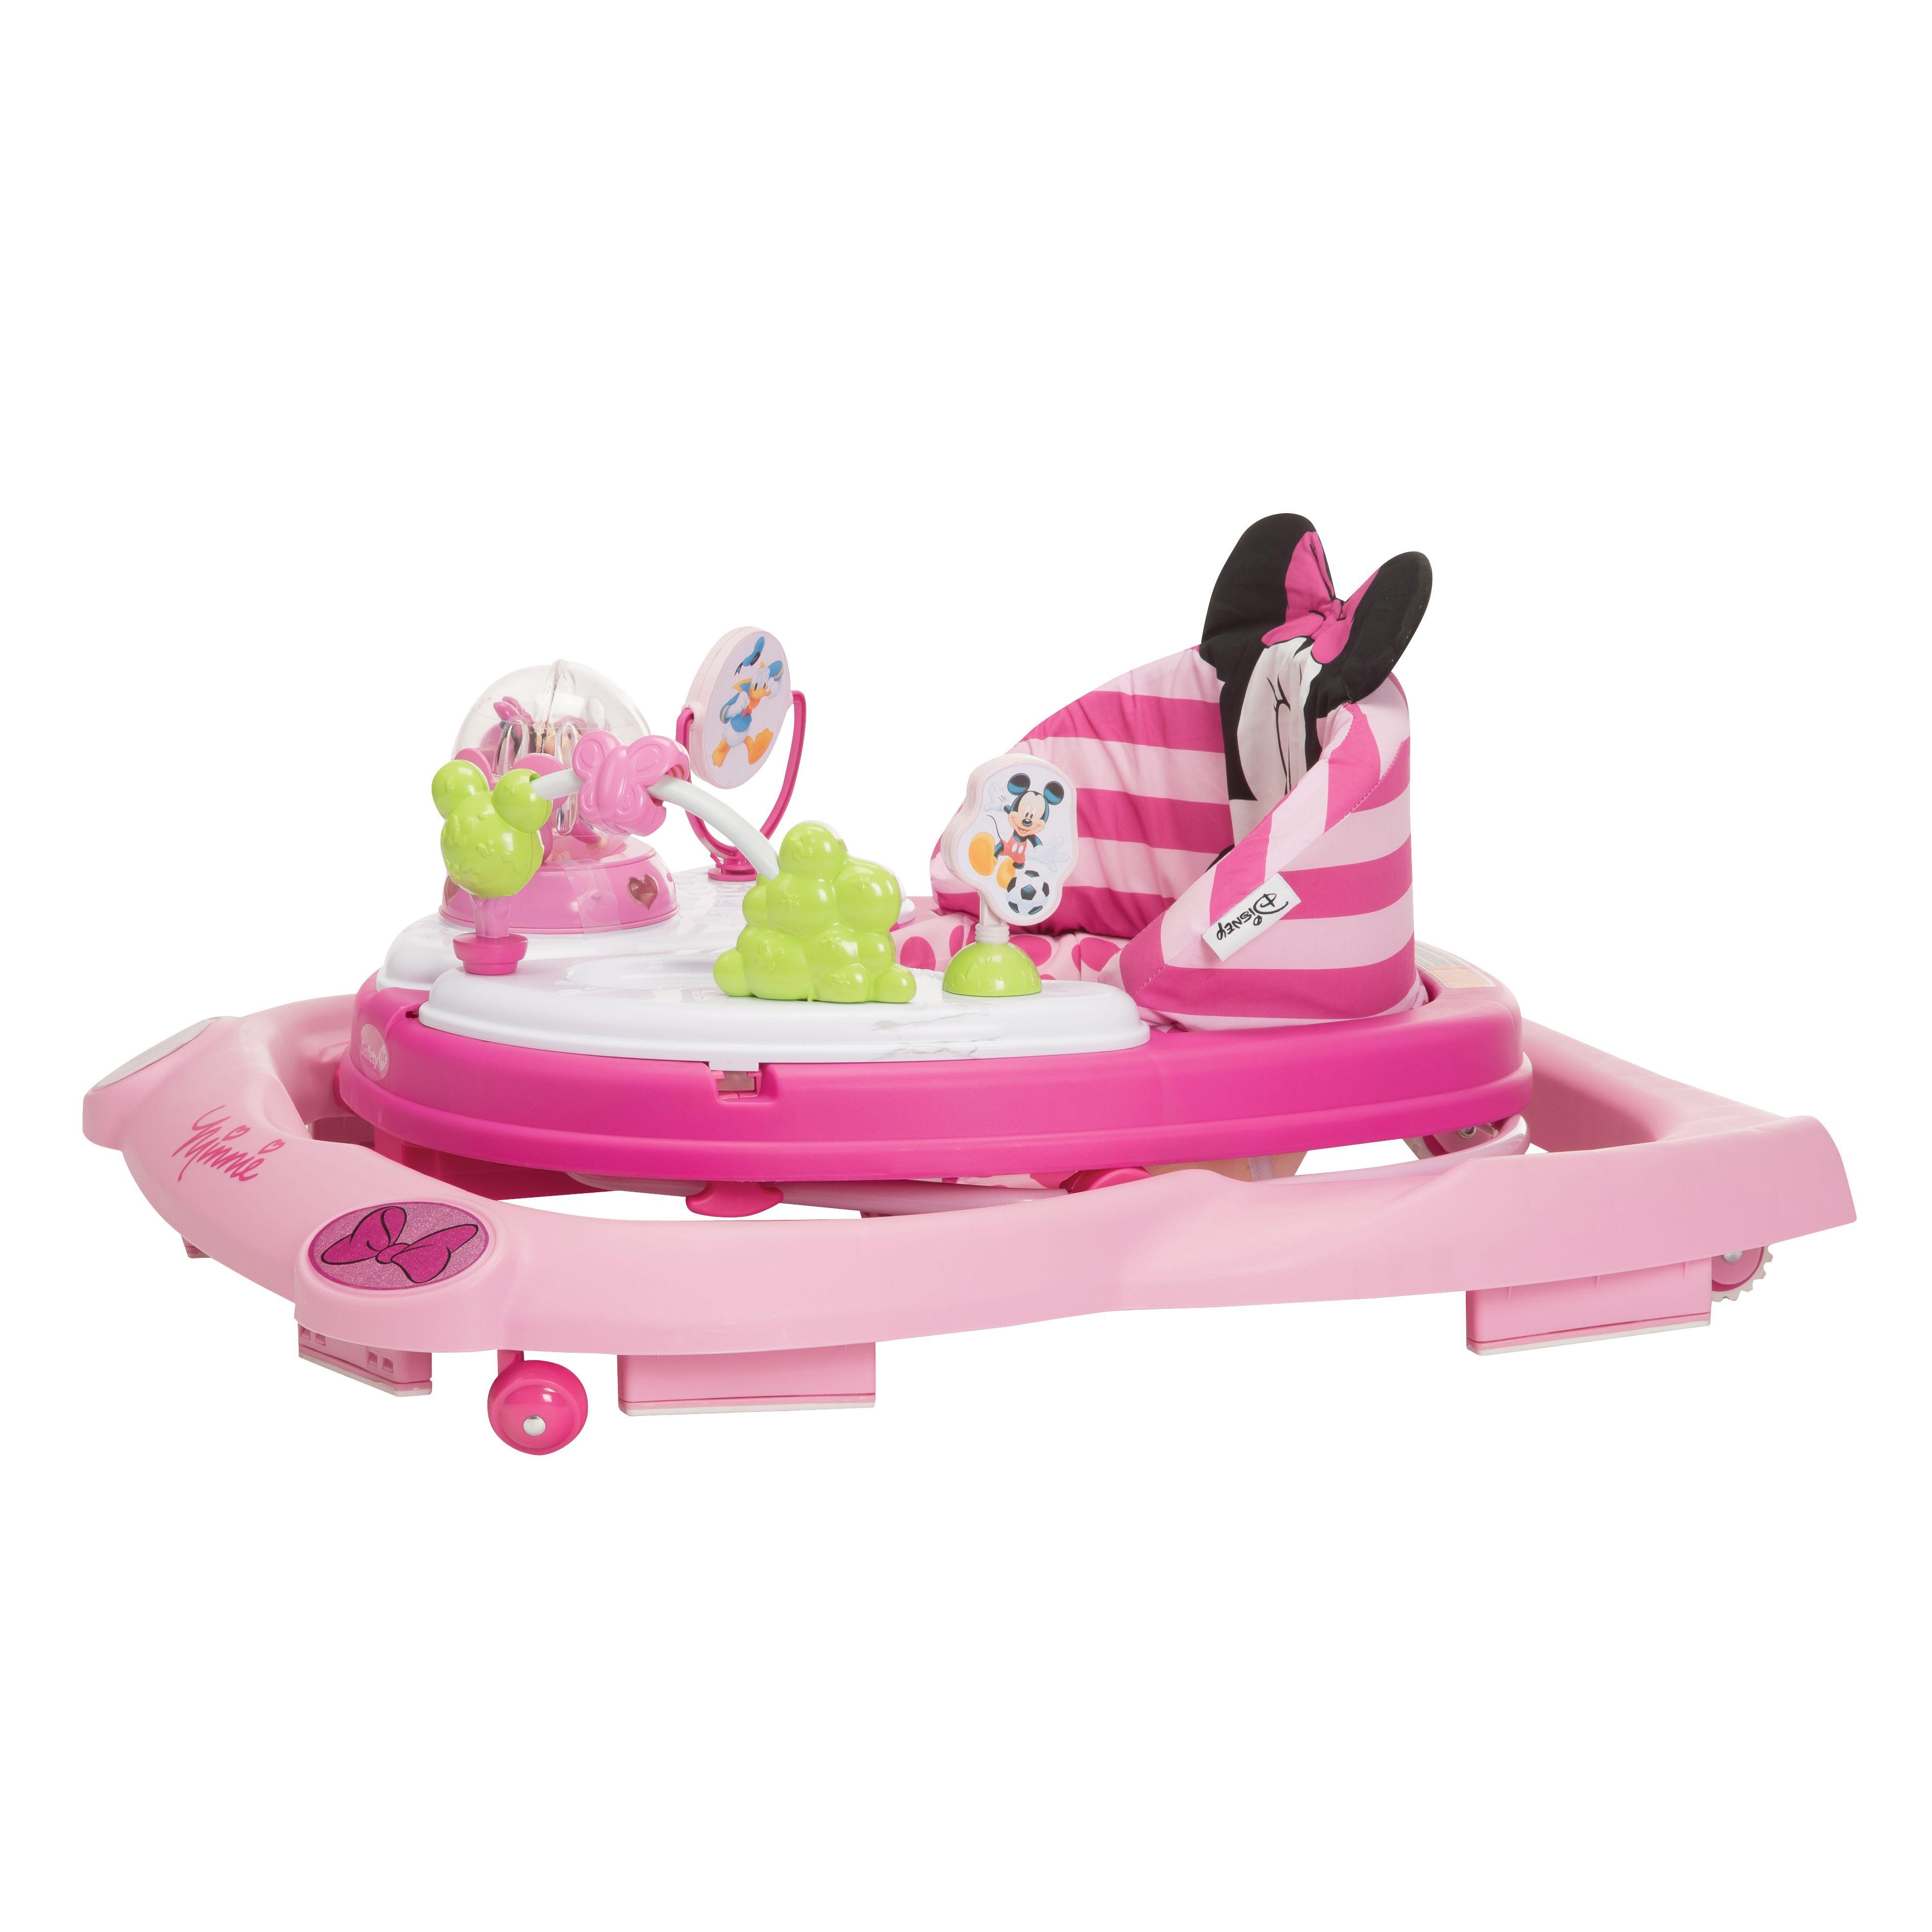 Disney Baby Minnie Mouse Music Baby Minnie Baby Disney Baby Minnie Mouse